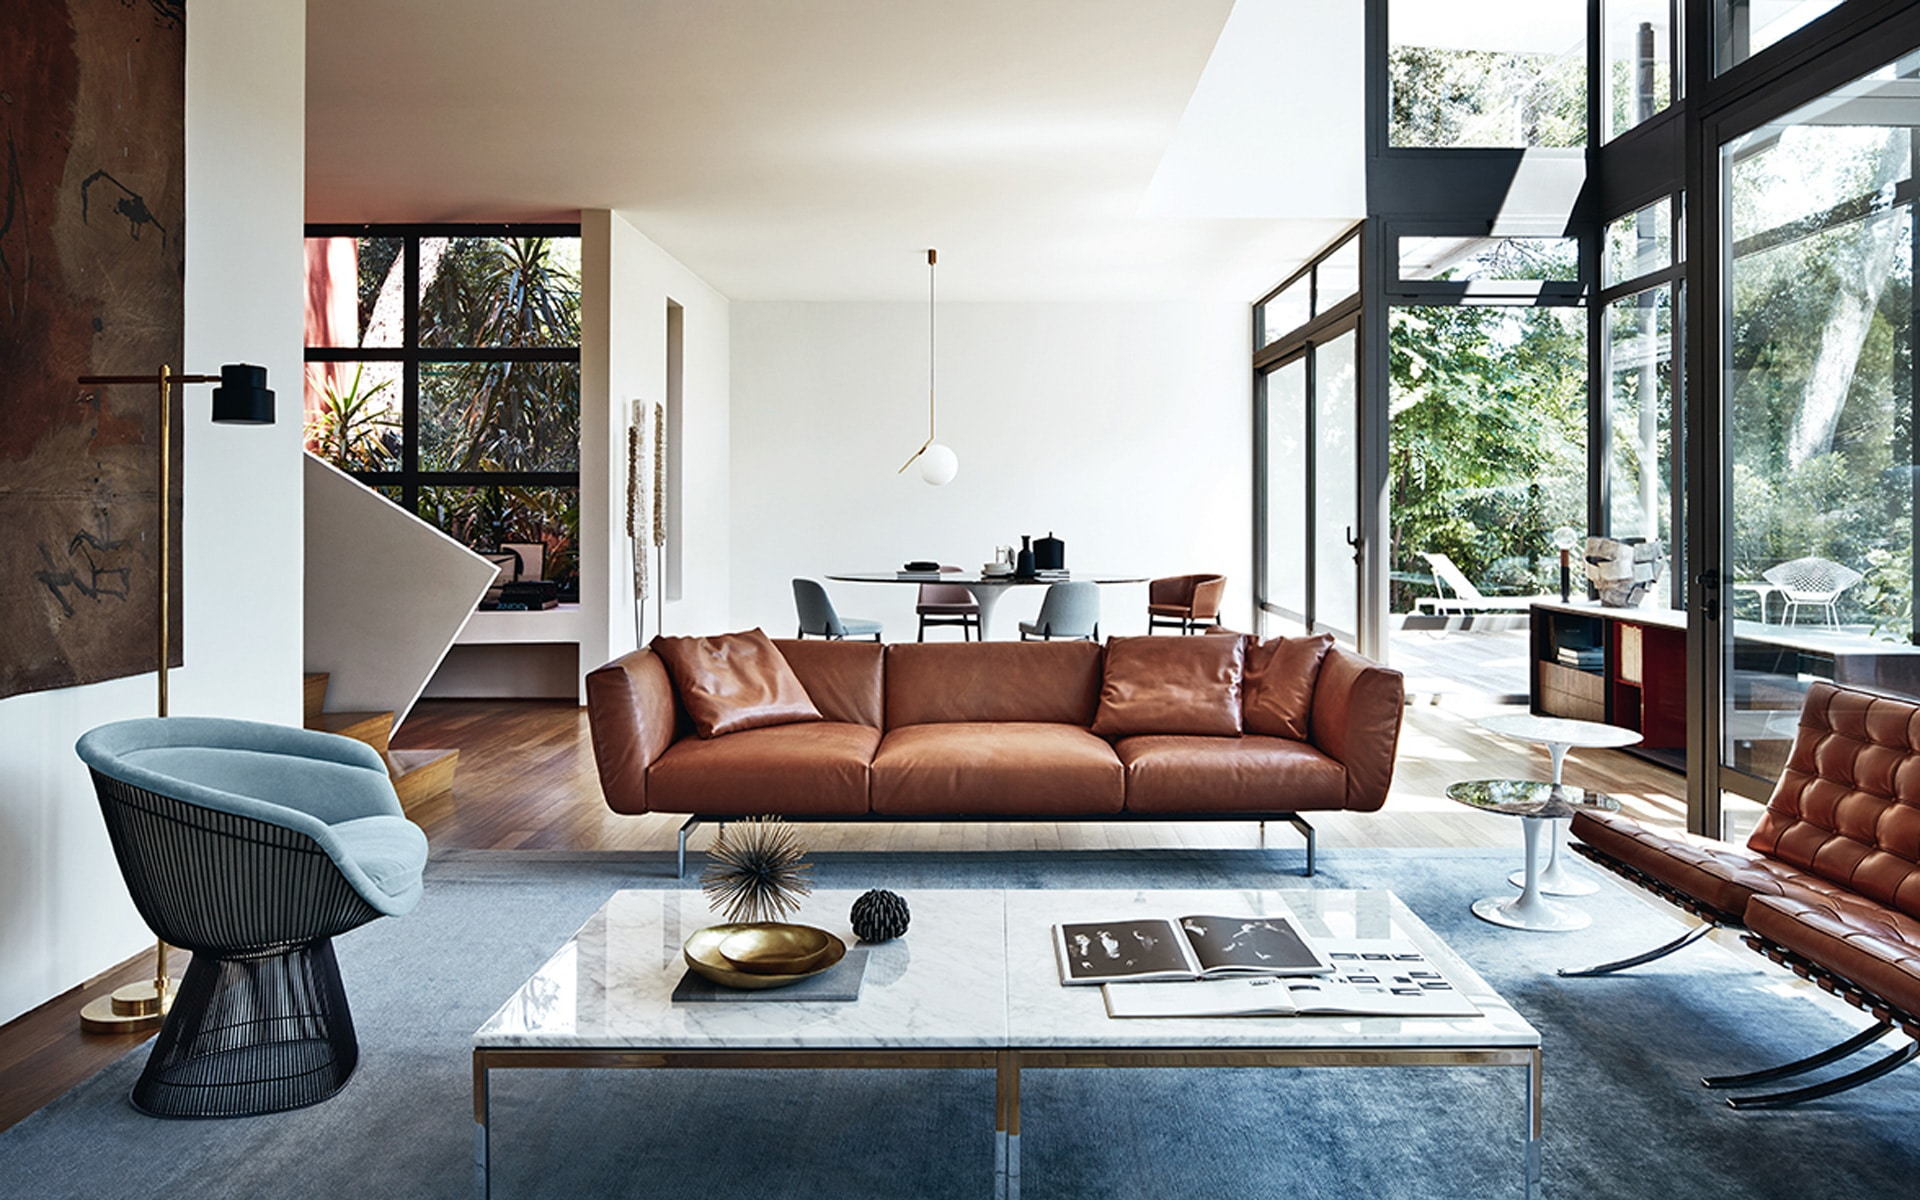 katharina-kamm-de-innenarchitektur-gmund-tegernsee-concept-store-knollstudio-platner-lounge-chair-avio-sofa-barcelona-stool